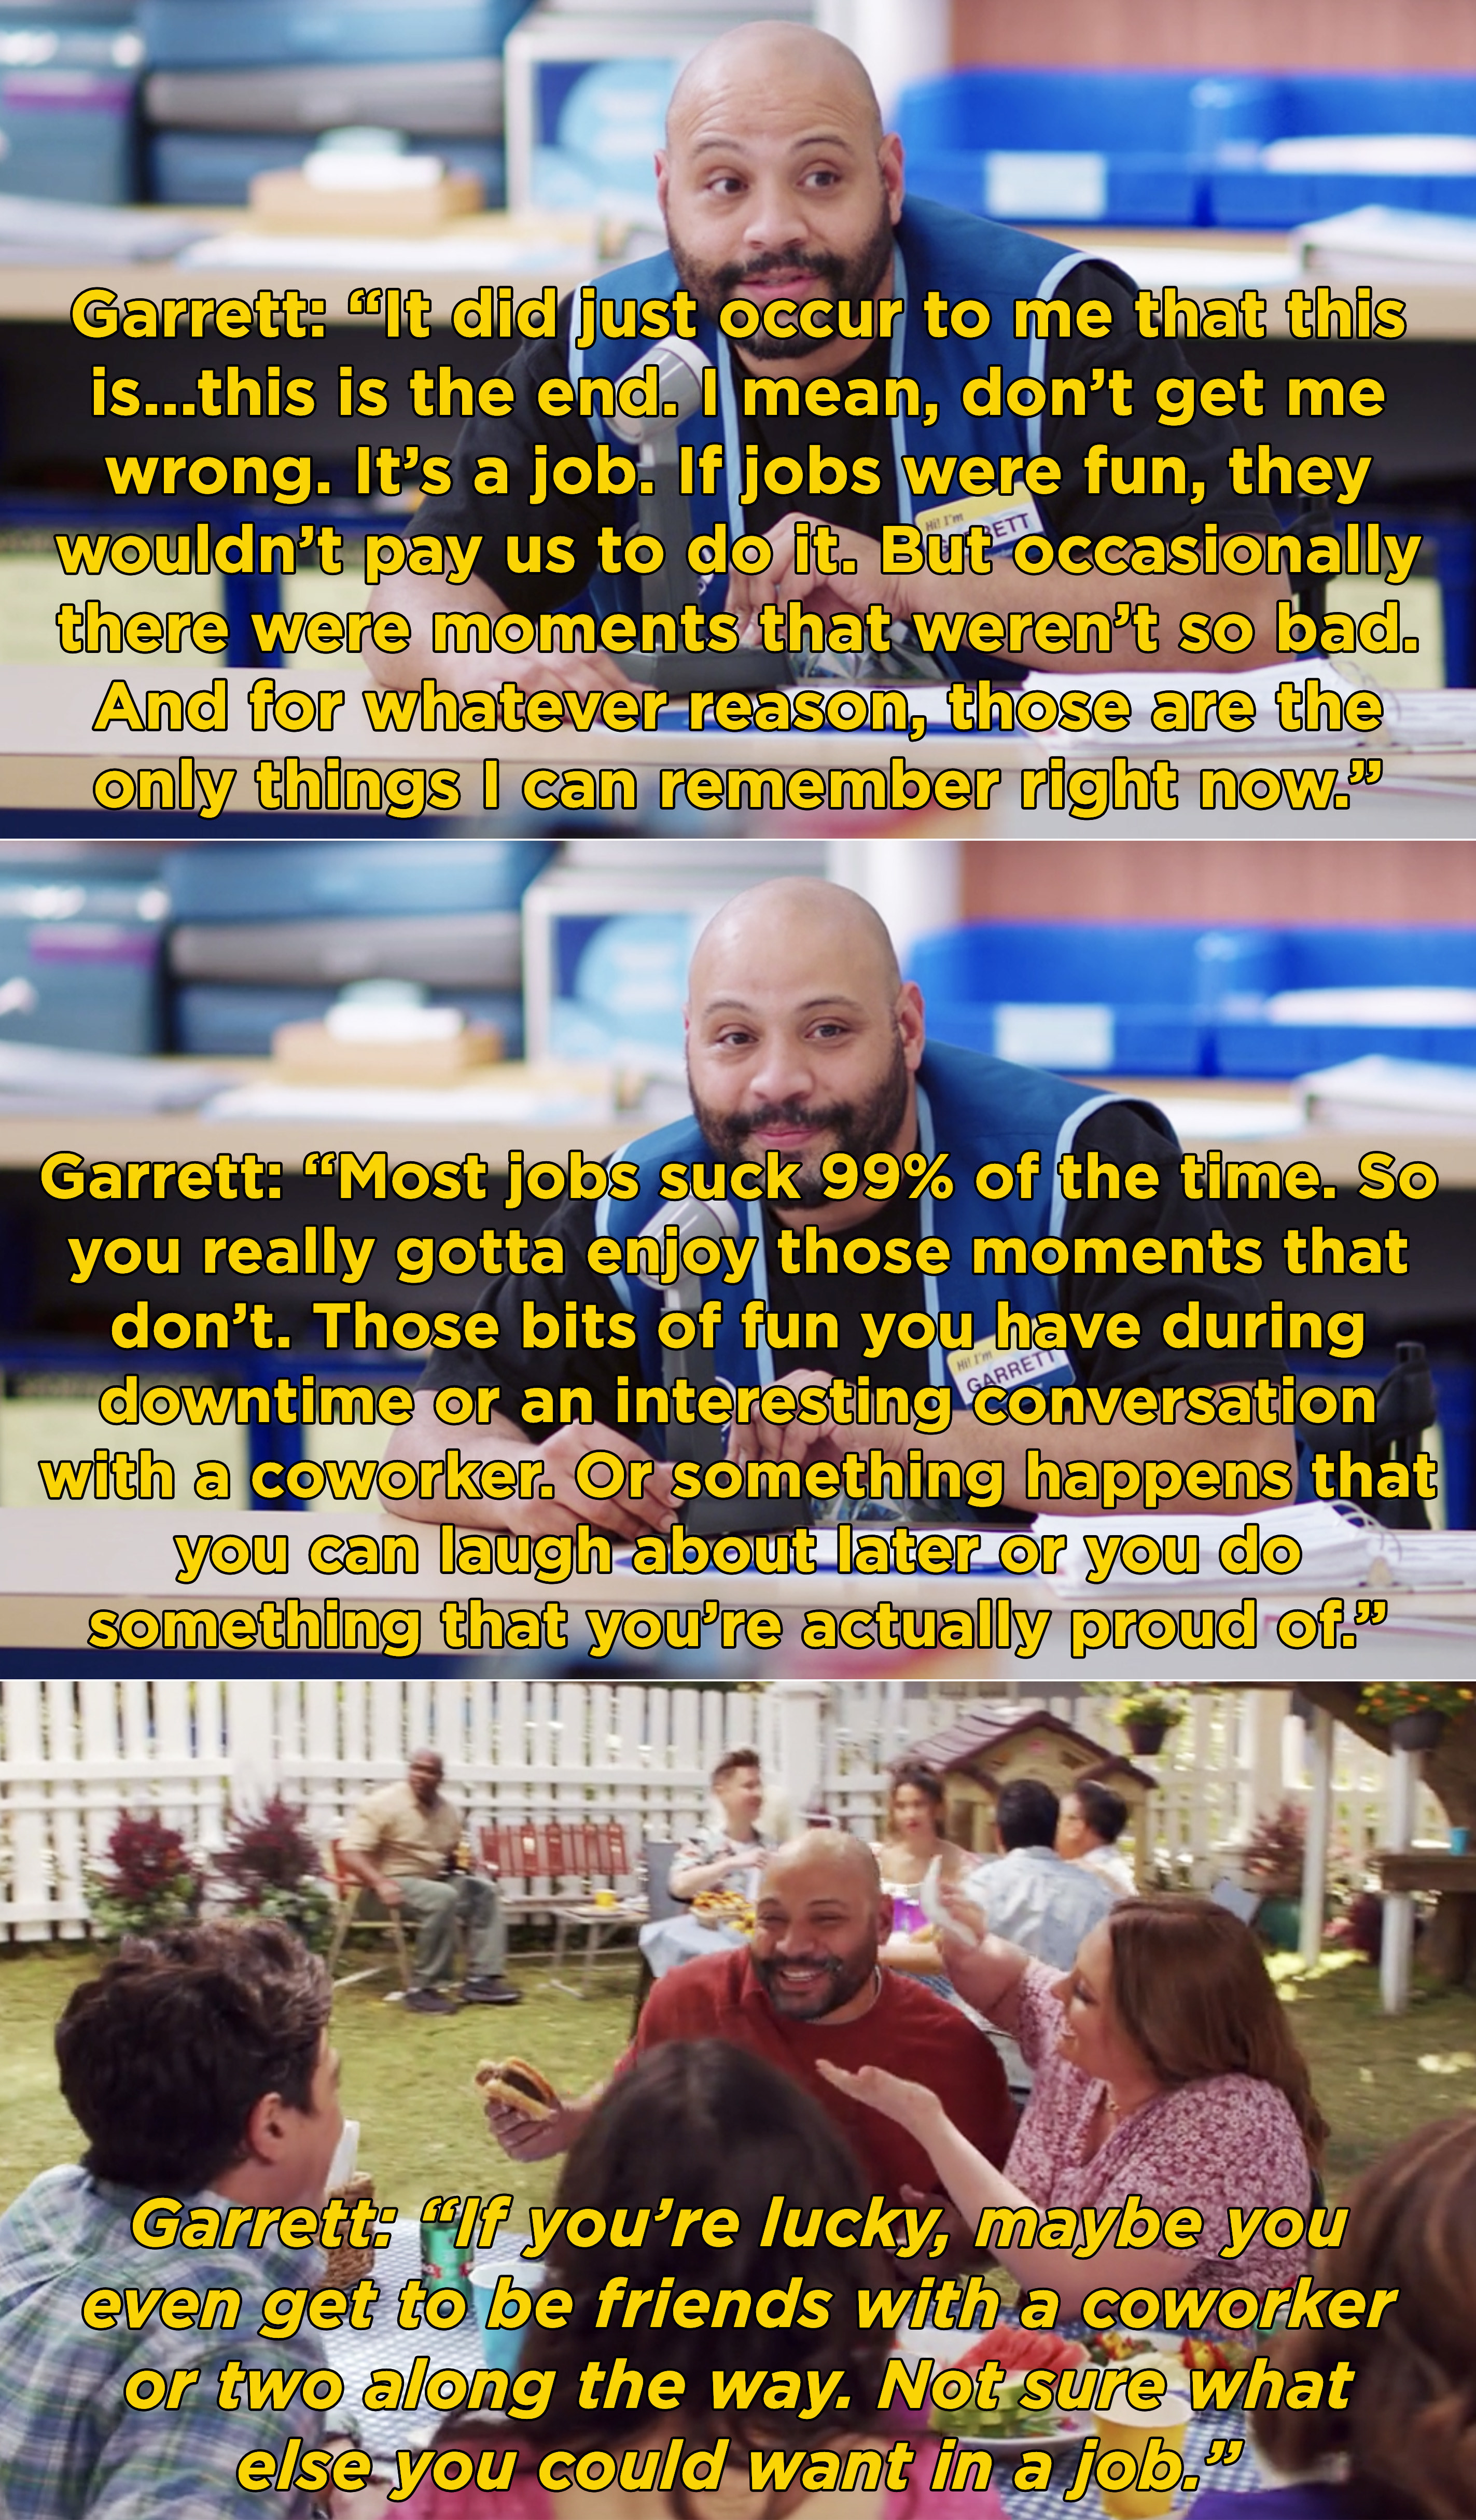 Garrett explaining how working at Cloud 9 never felt like a job because they always had fun